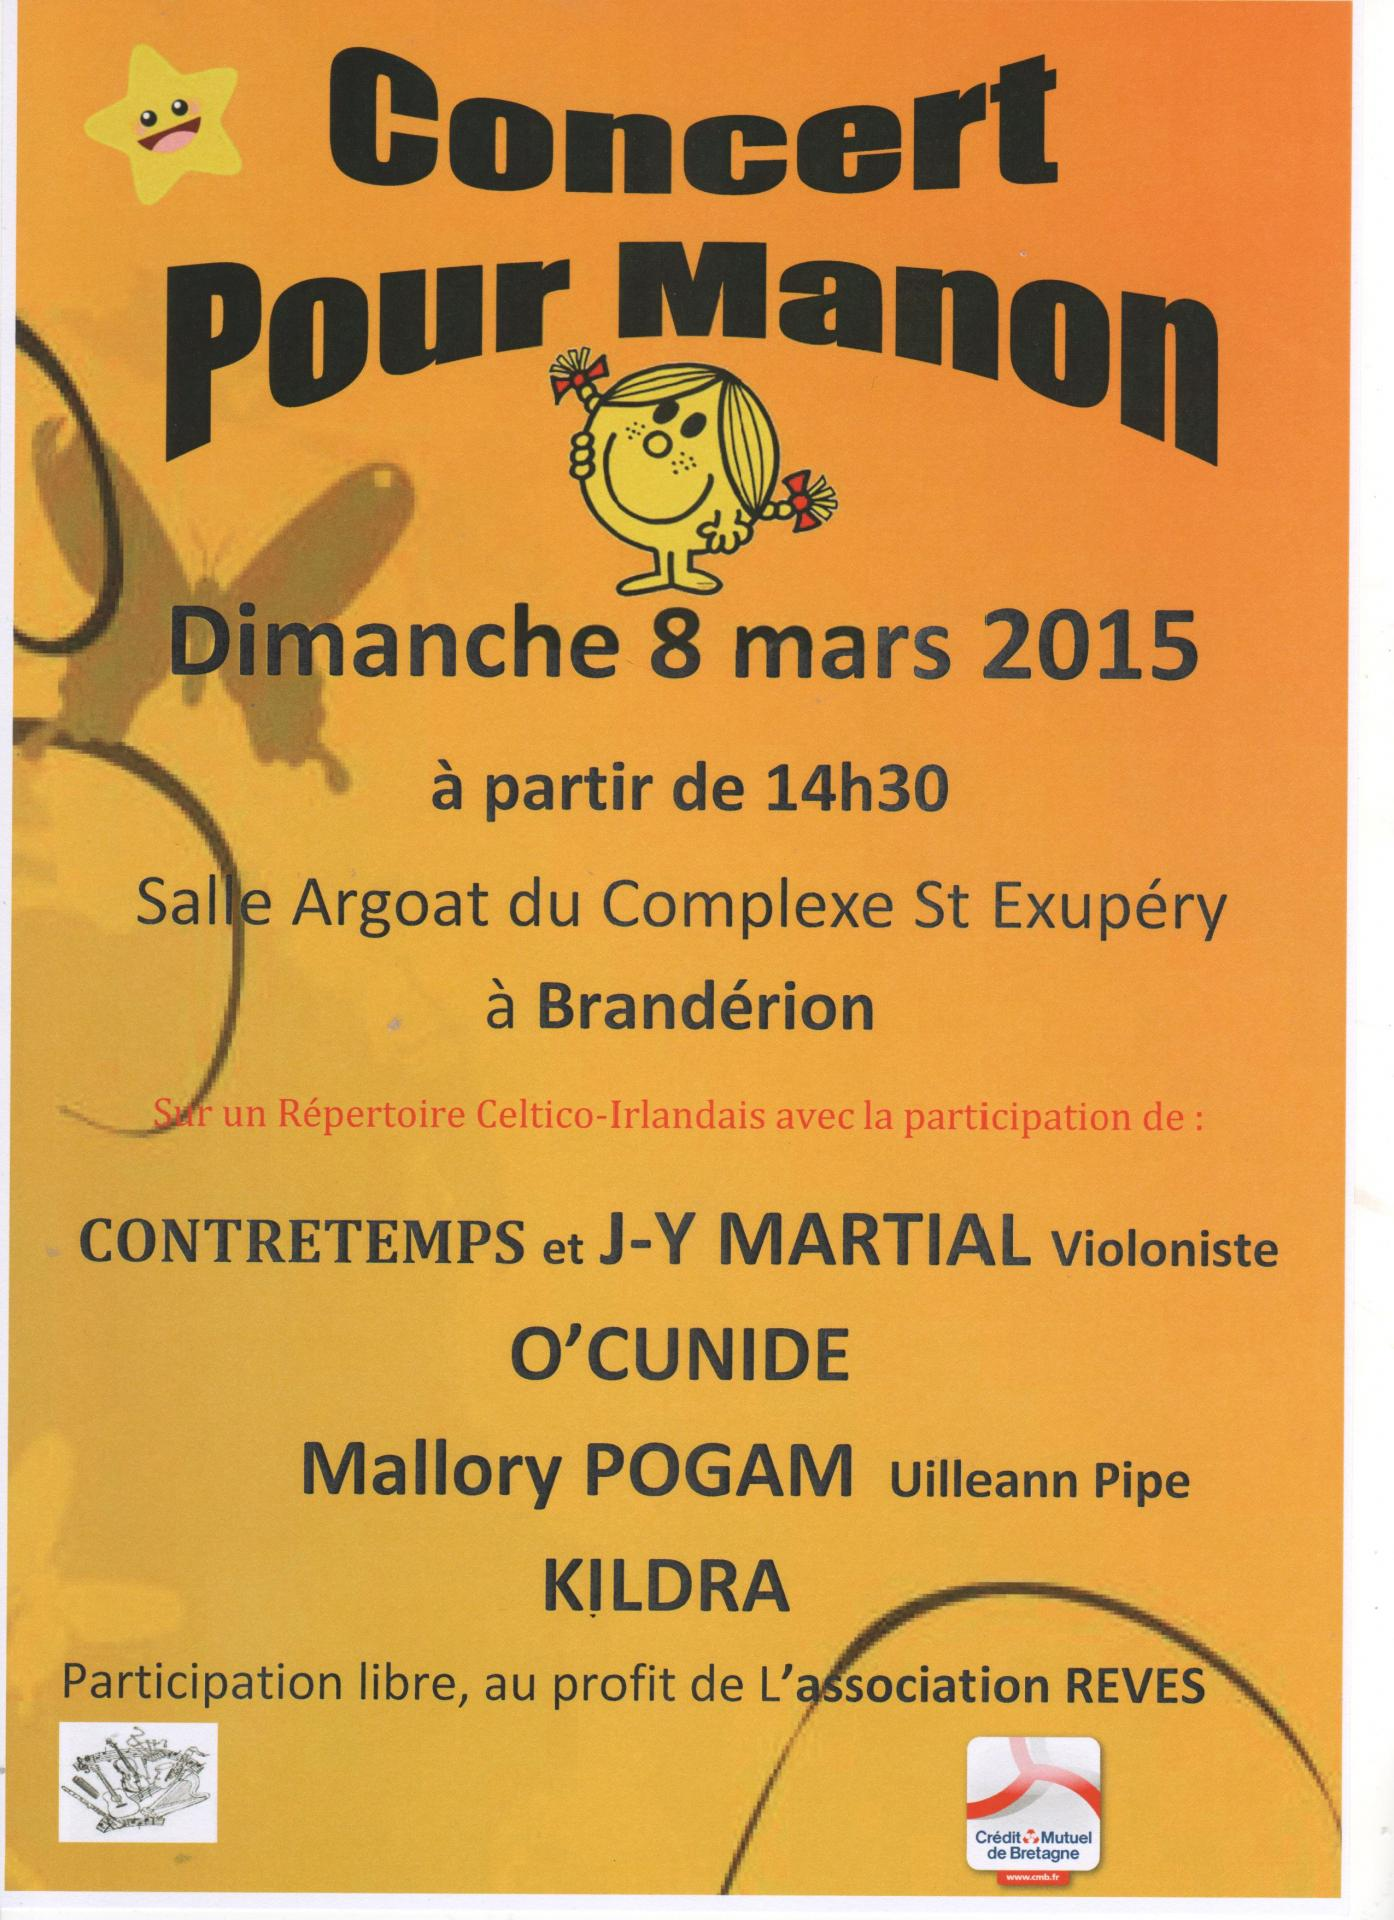 Concert manon 001